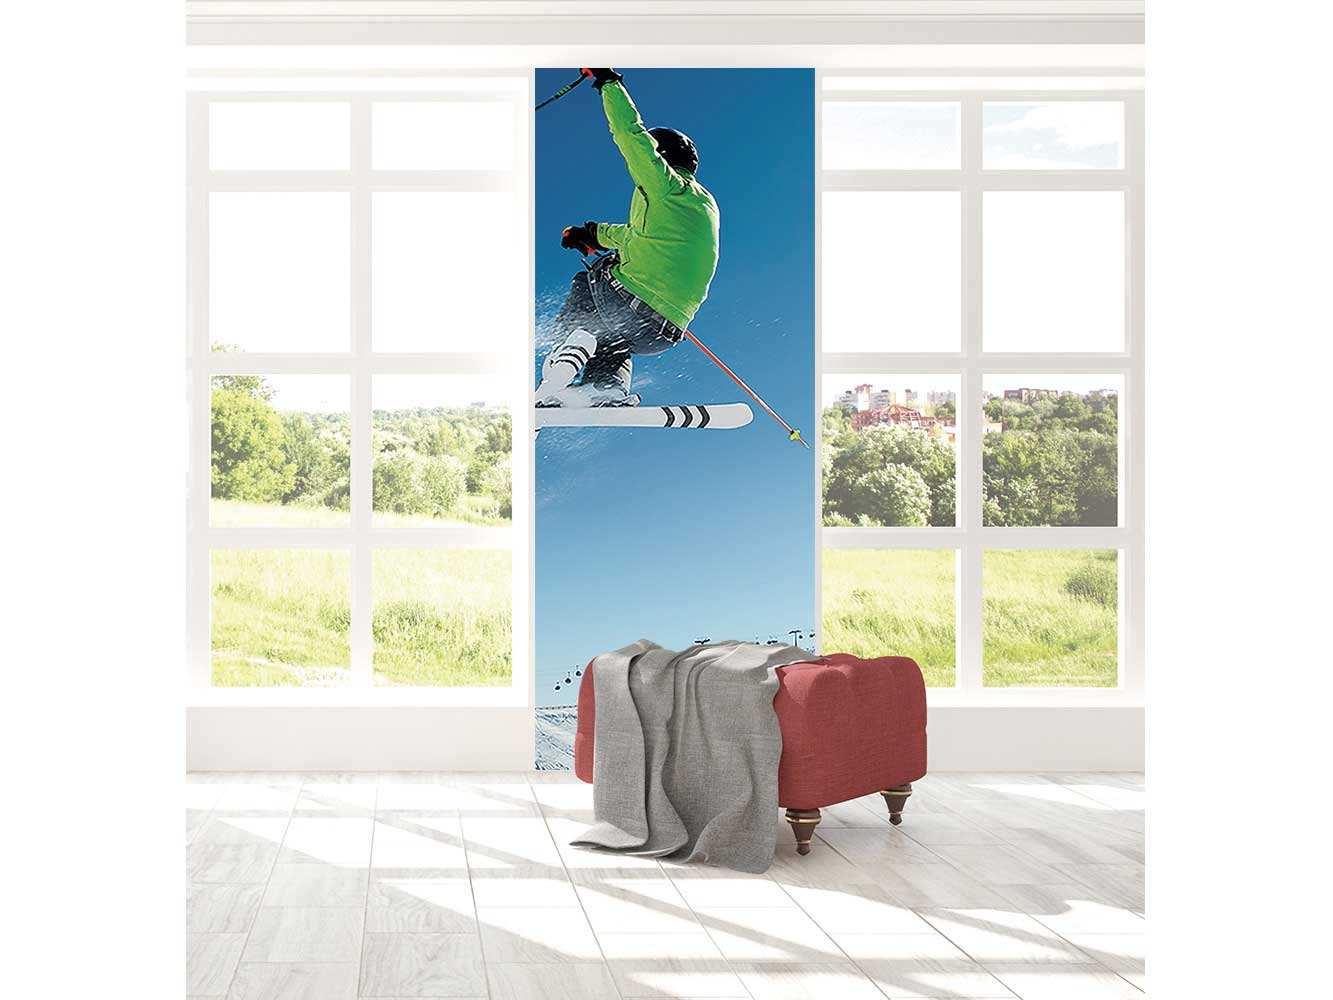 Cenefa Vertical Esquiador en la Nieve | Carteles XXL - Impresión carteleria publicitaria